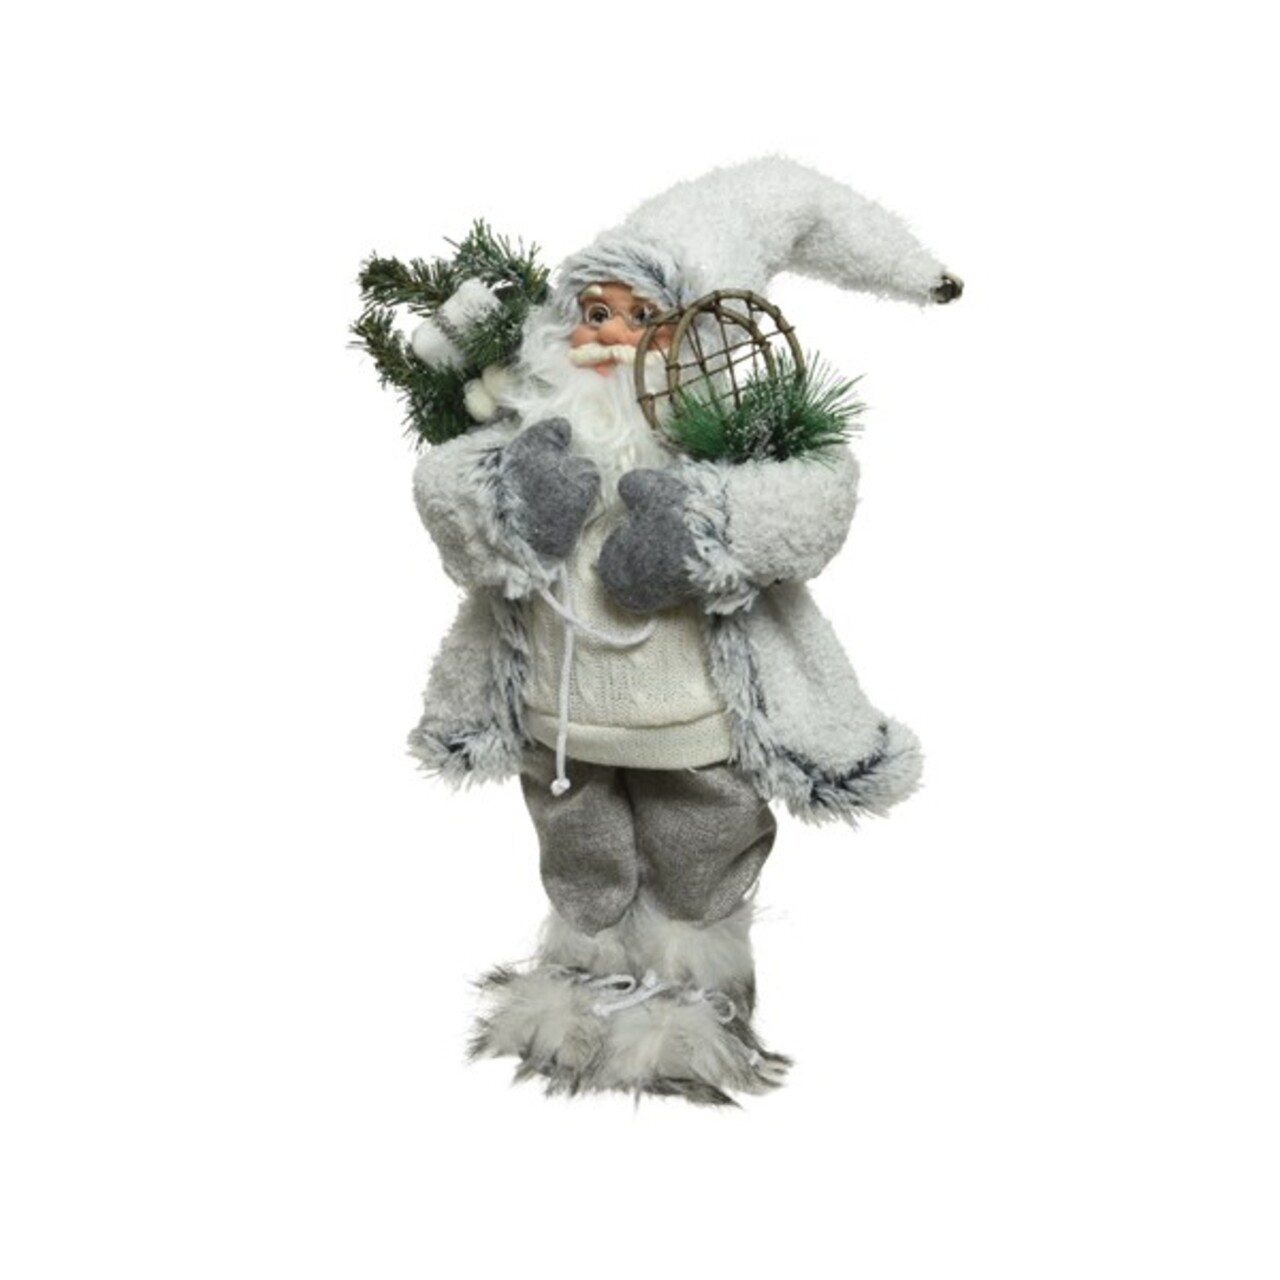 Decoratiune Santa w snow shoes, Decoris, H30 cm, poliester, alb